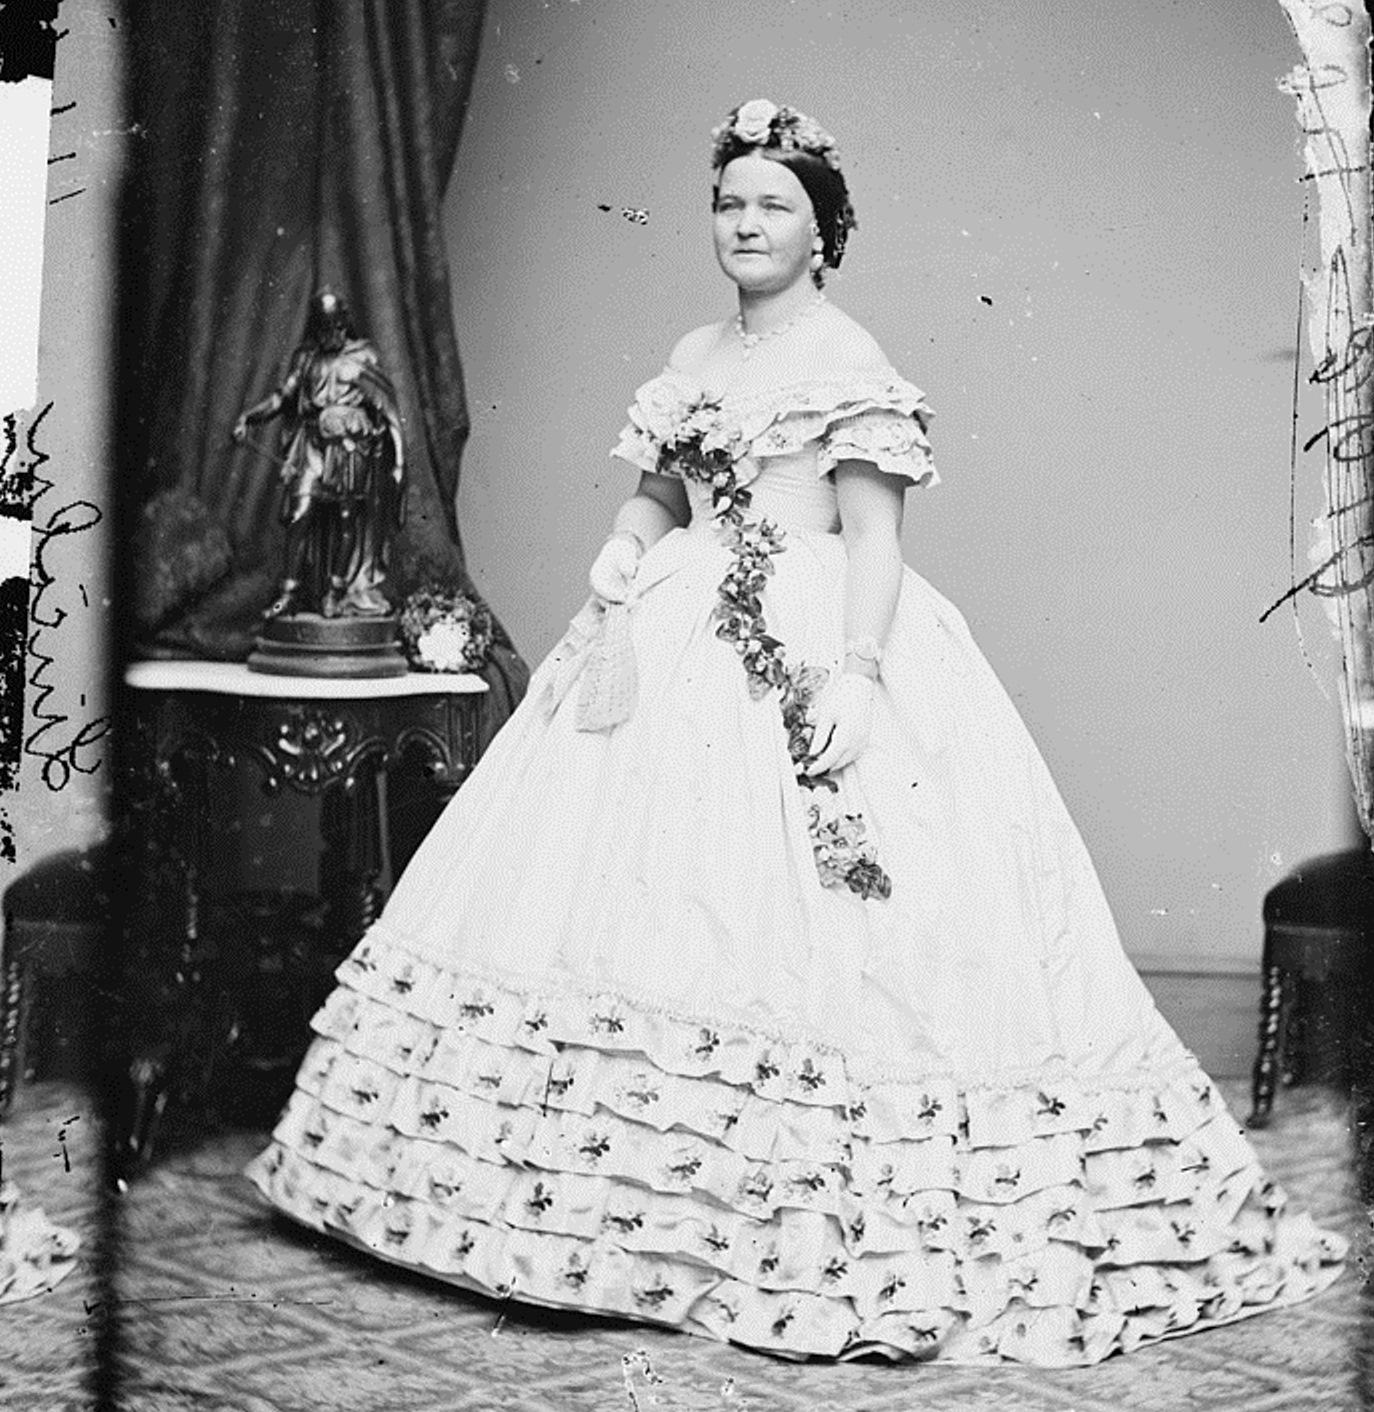 Mary Todd Lincoln's seamstress